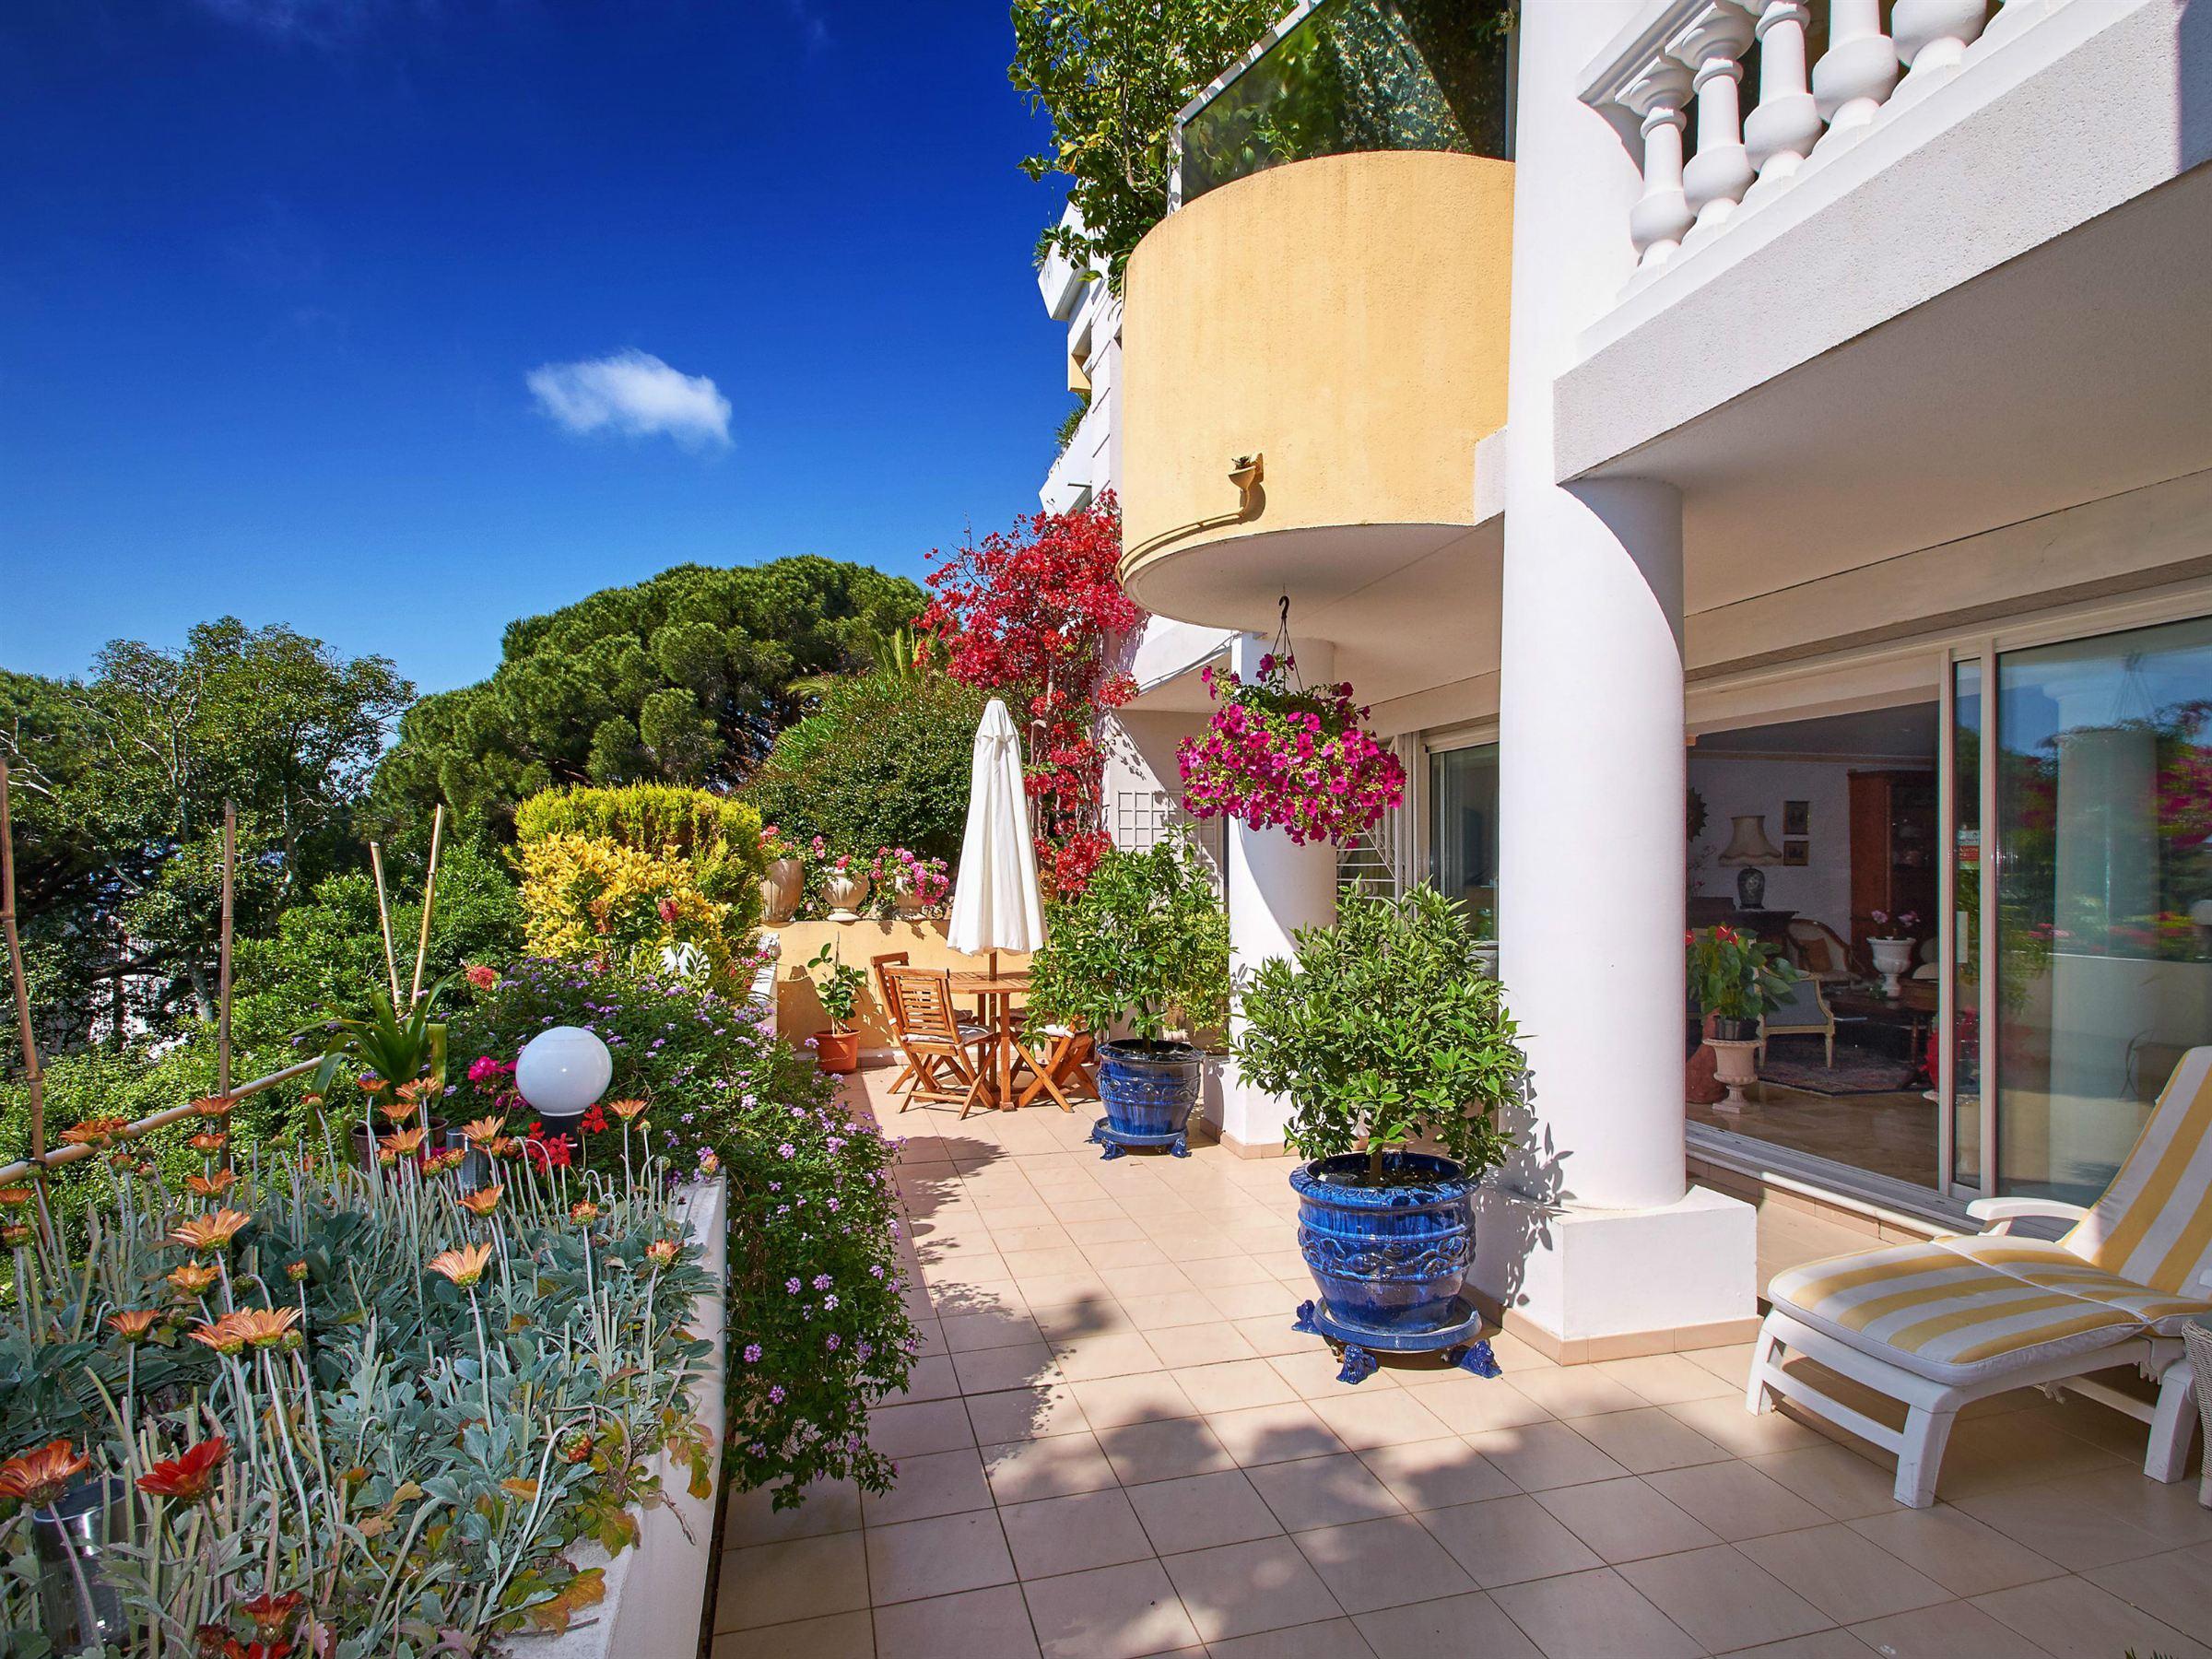 公寓 为 销售 在 Upscale apartment for sale in Cannes Californie - sea views 坎尼, 普罗旺斯阿尔卑斯蓝色海岸, 06400 法国